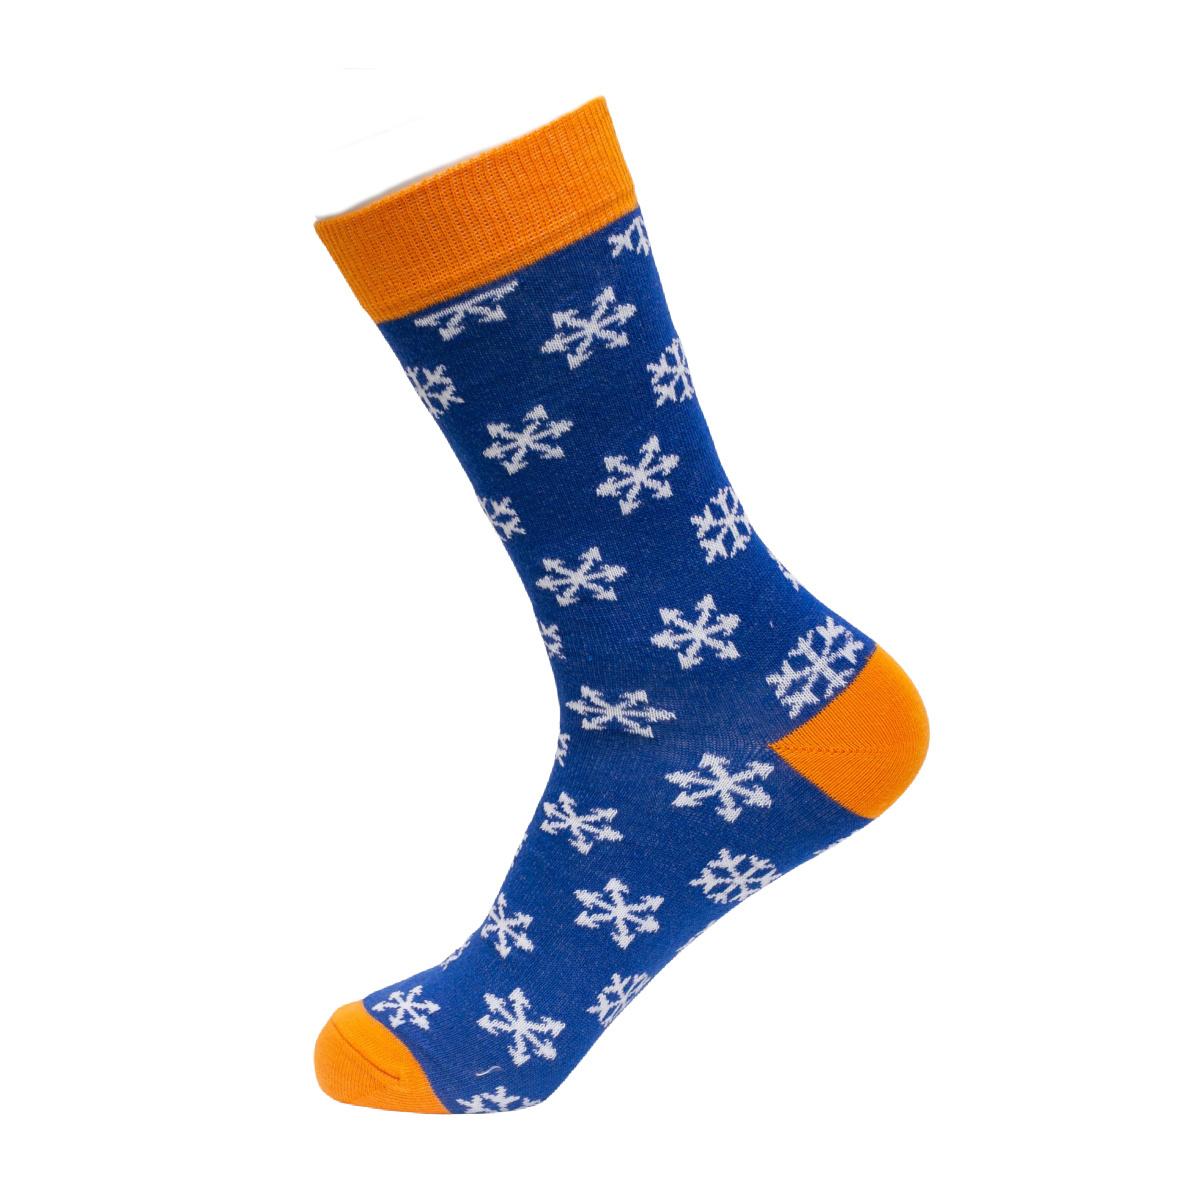 Socks Atomica Socks Atomica Snowflakes